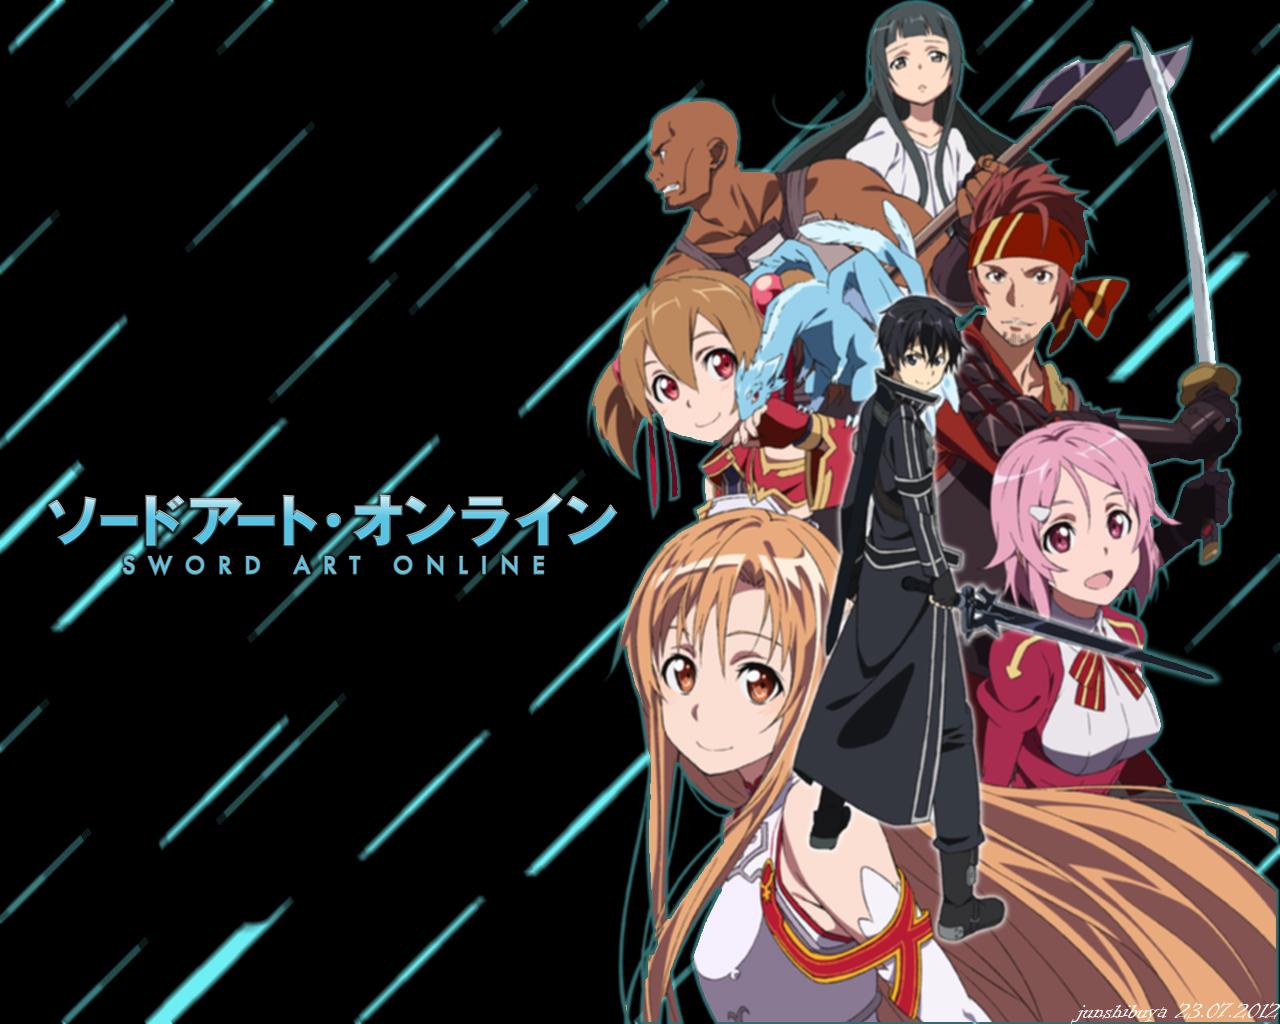 [Imagen: sword_art_online_1_by_junshibuya-d58f436.jpg]